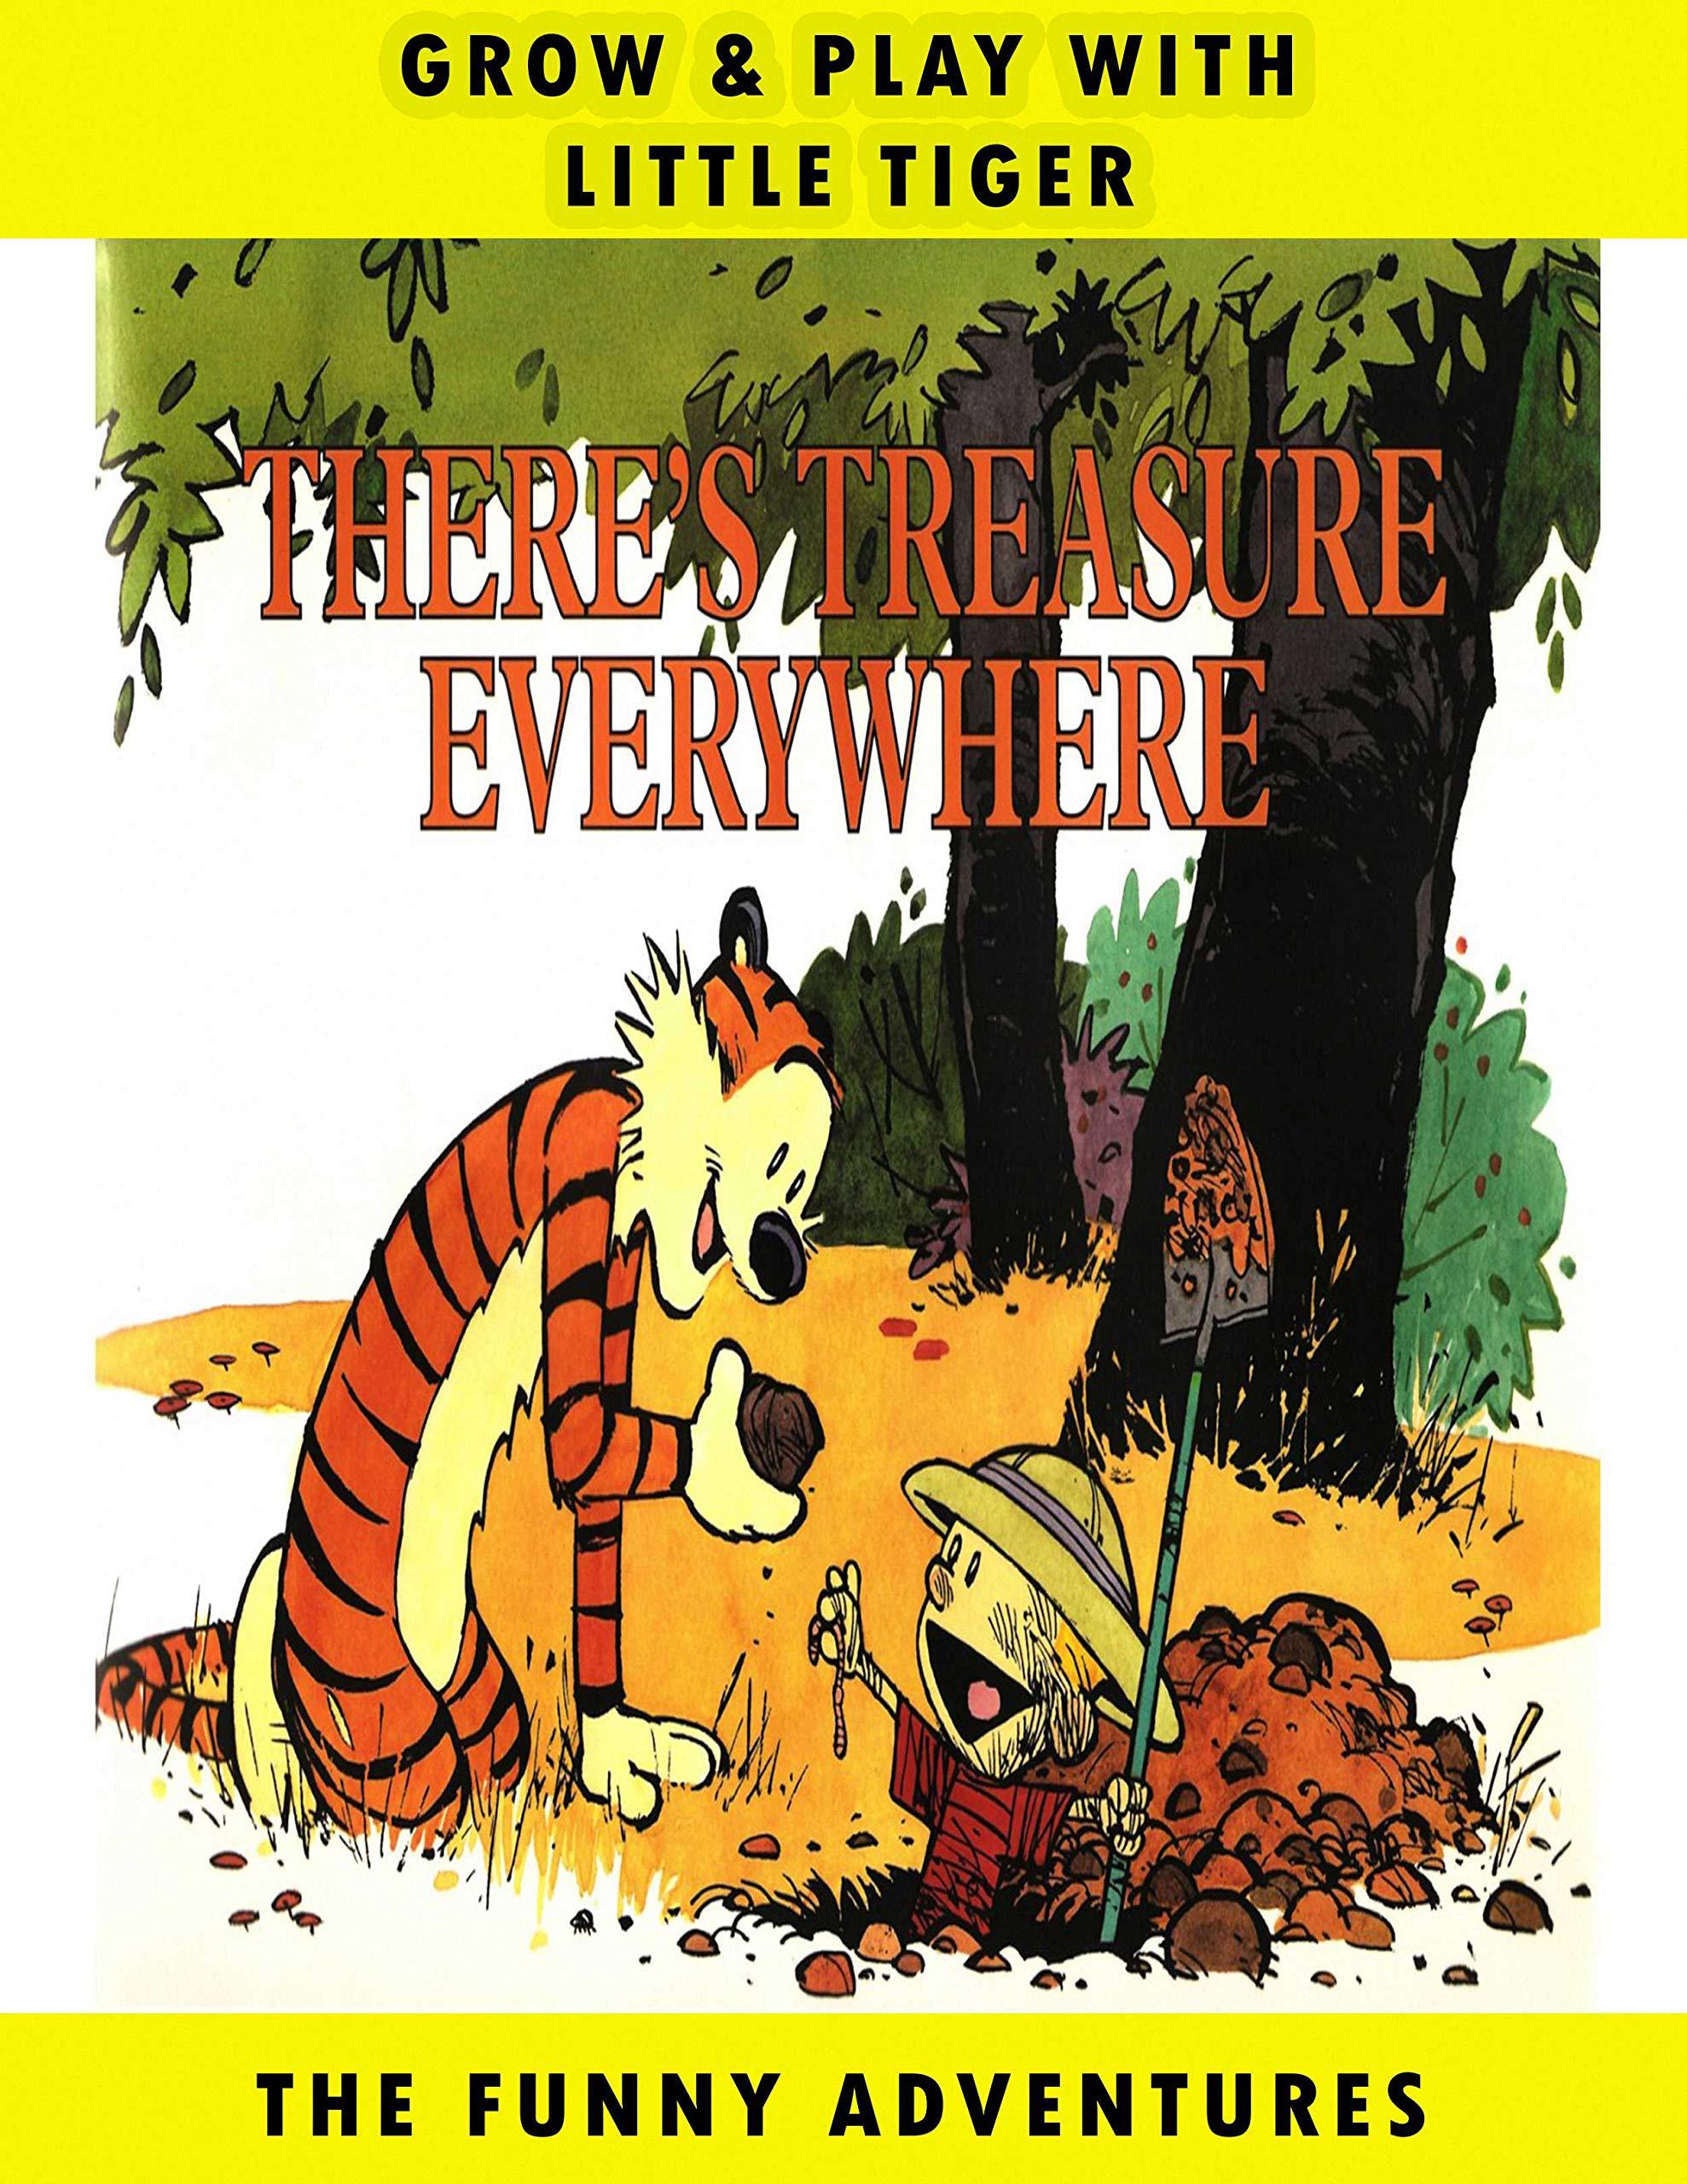 Little Tiger: Vol 10 - Great Calvin Adventure And Hobbes Cartoon Comics Books - For Kids, Boys , Girls , Fans , Adults